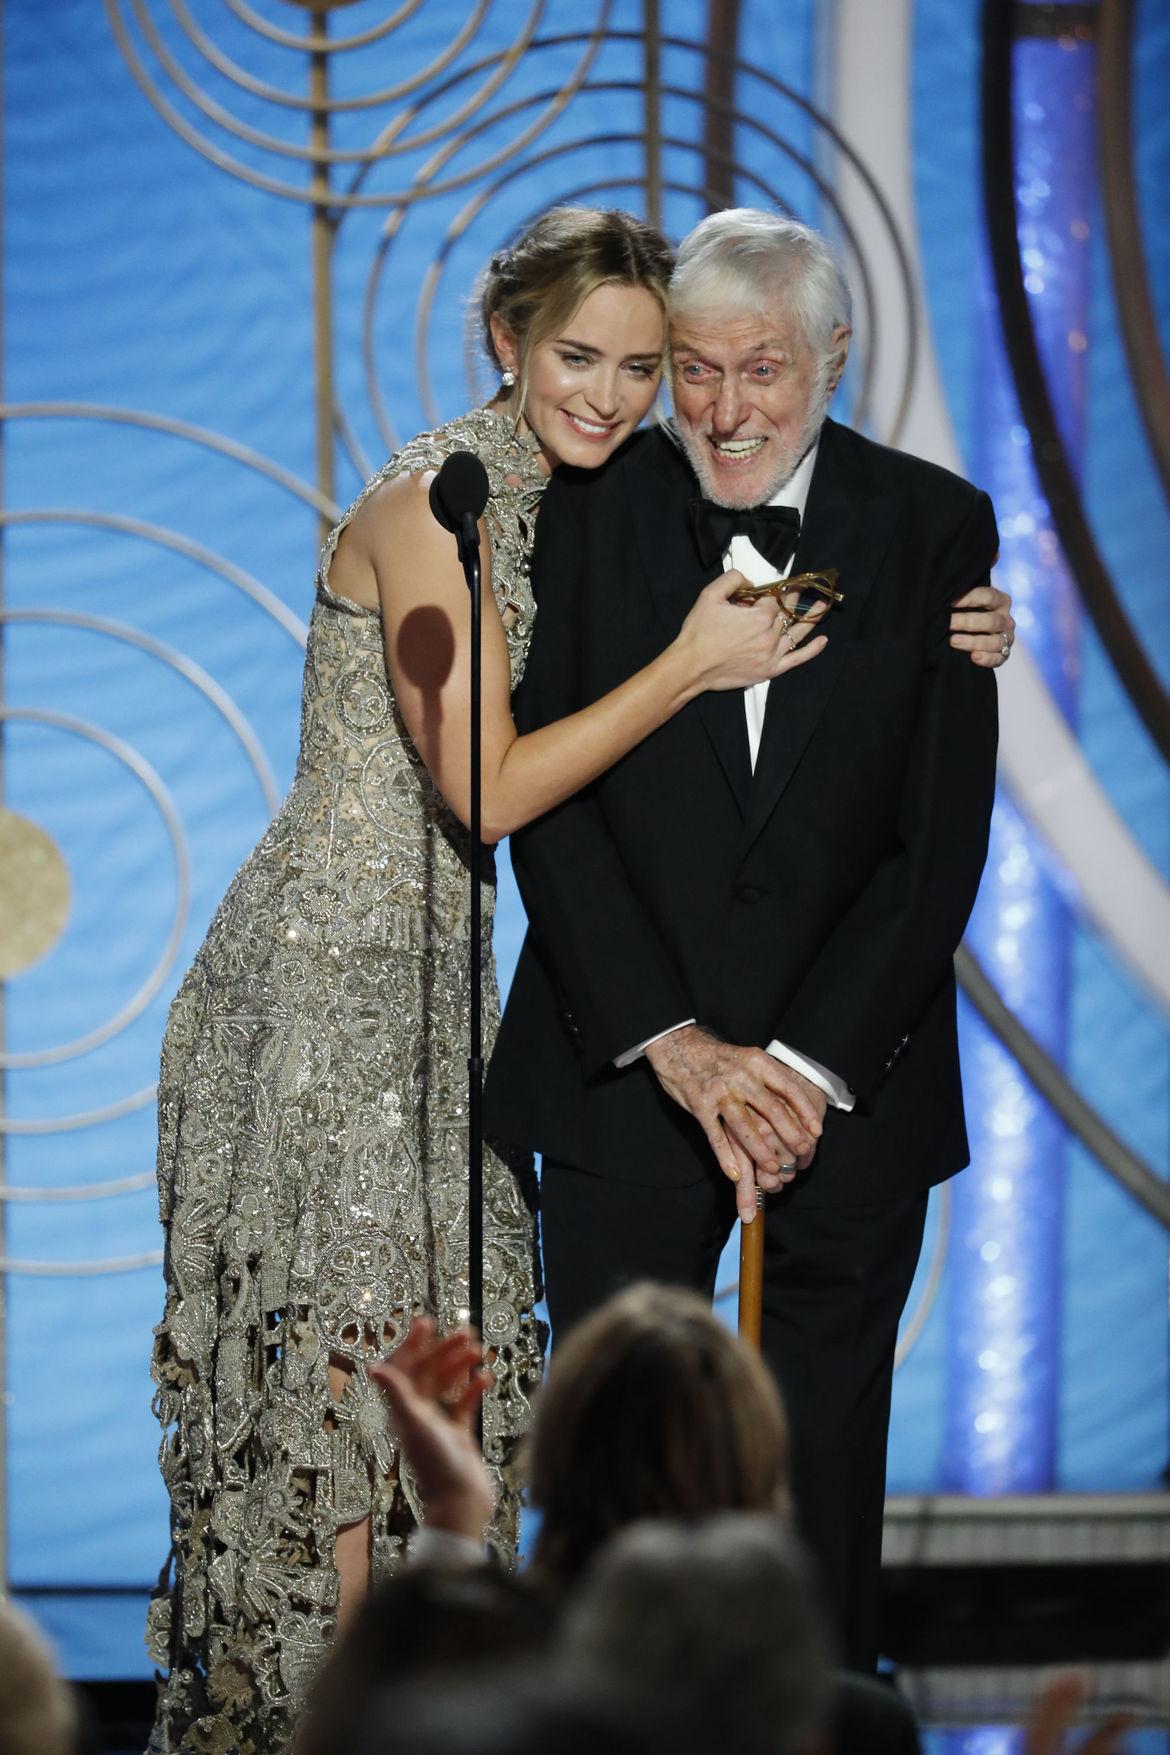 Emily Blunt Dick Van Dyke Mary Poppins Returns Golden Globes